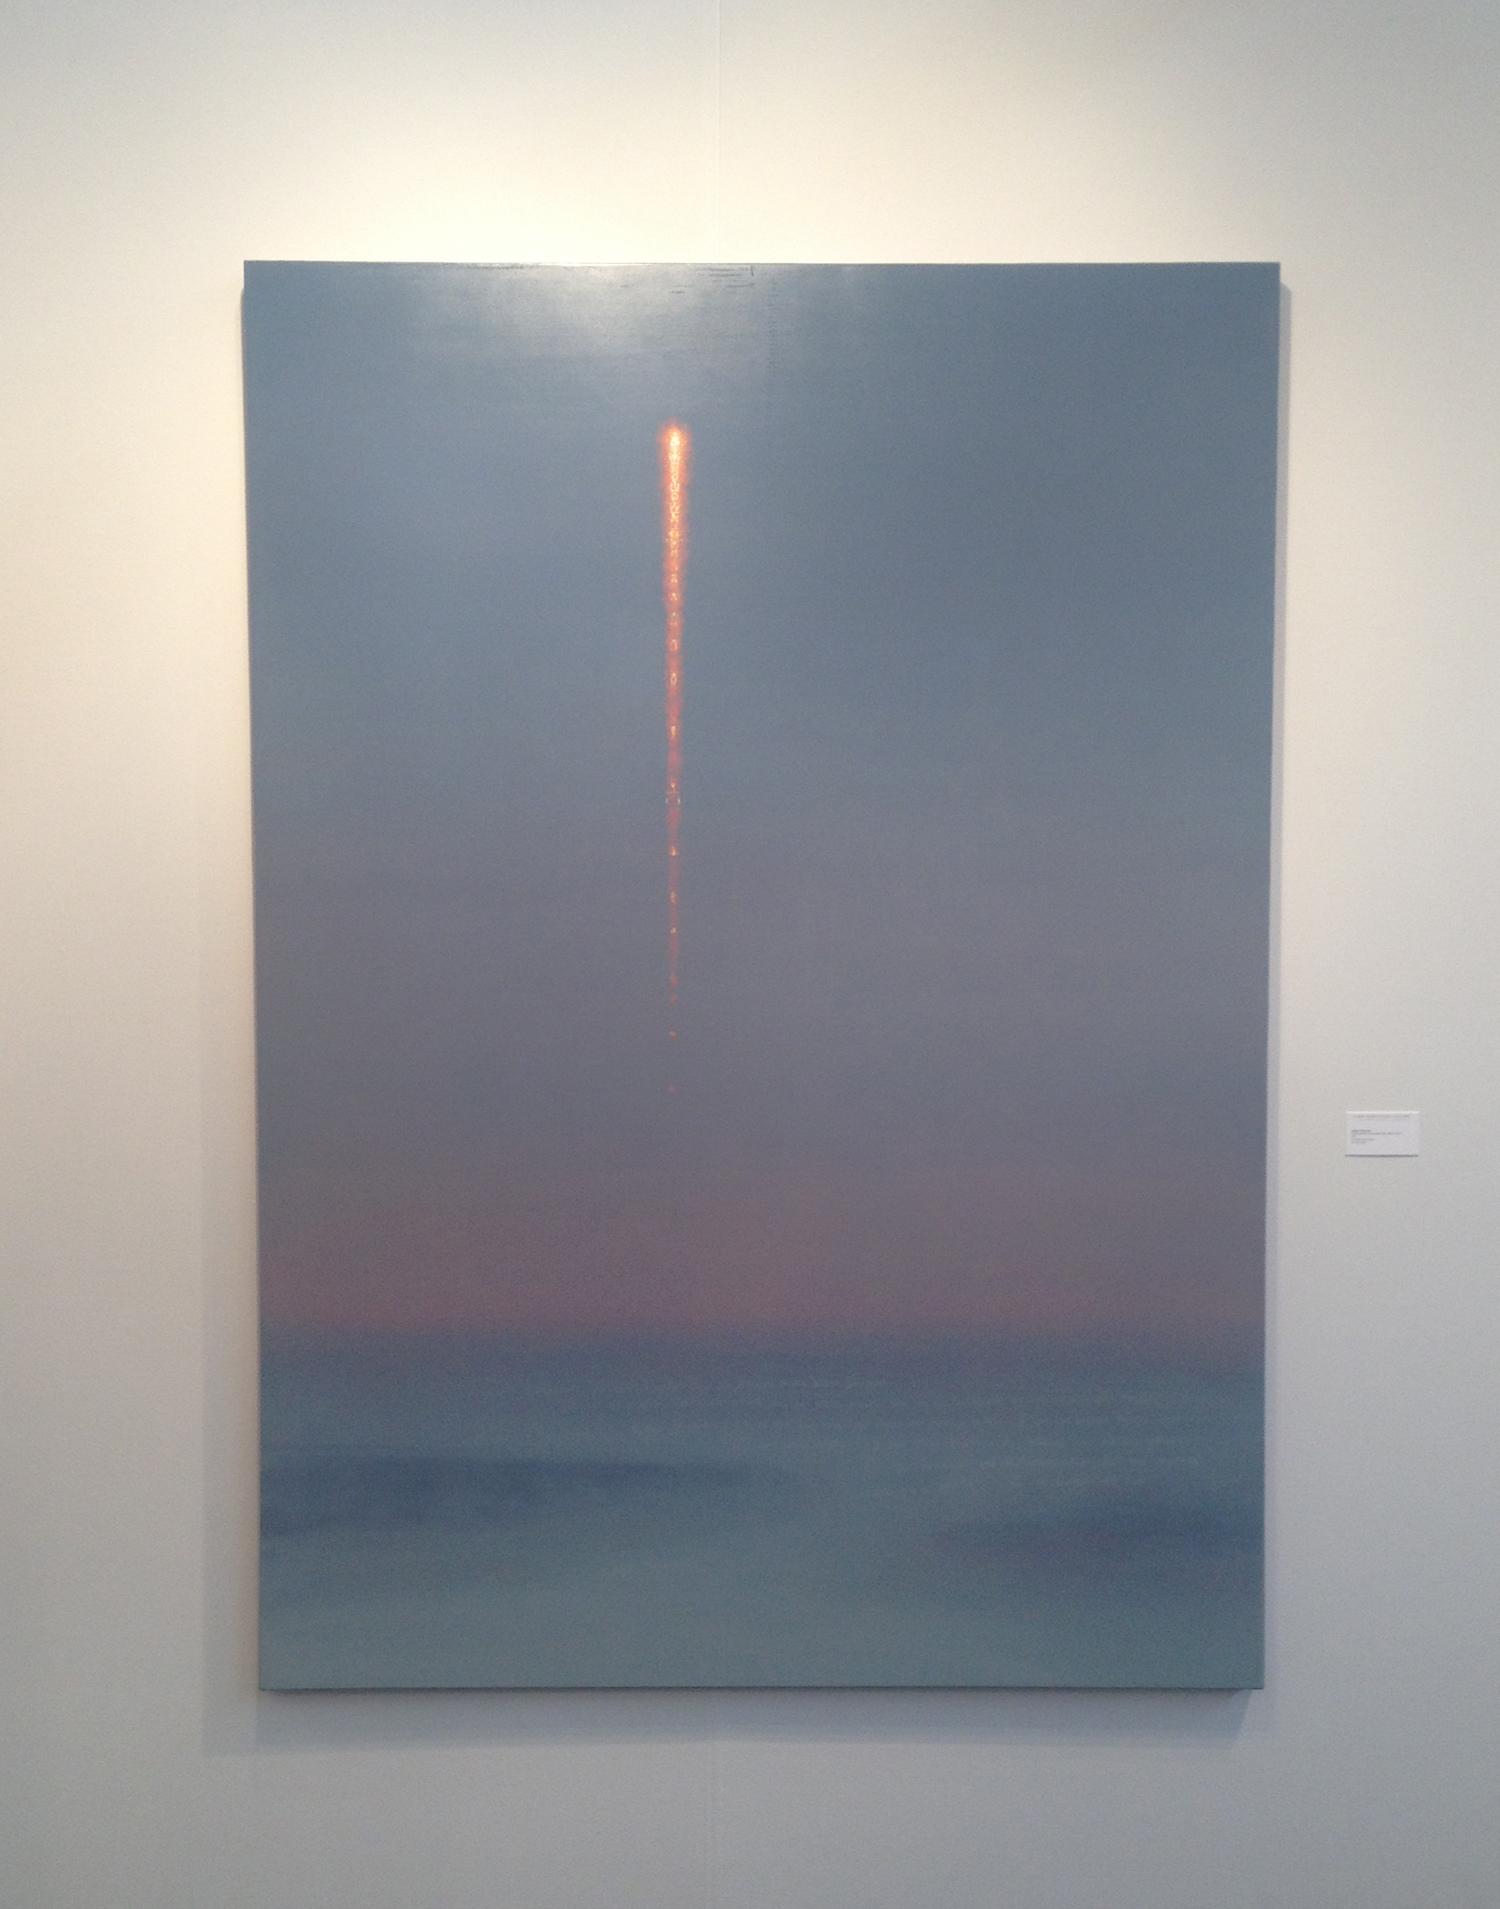 Stephen Hannock, titled Paul's Rocket at First Light